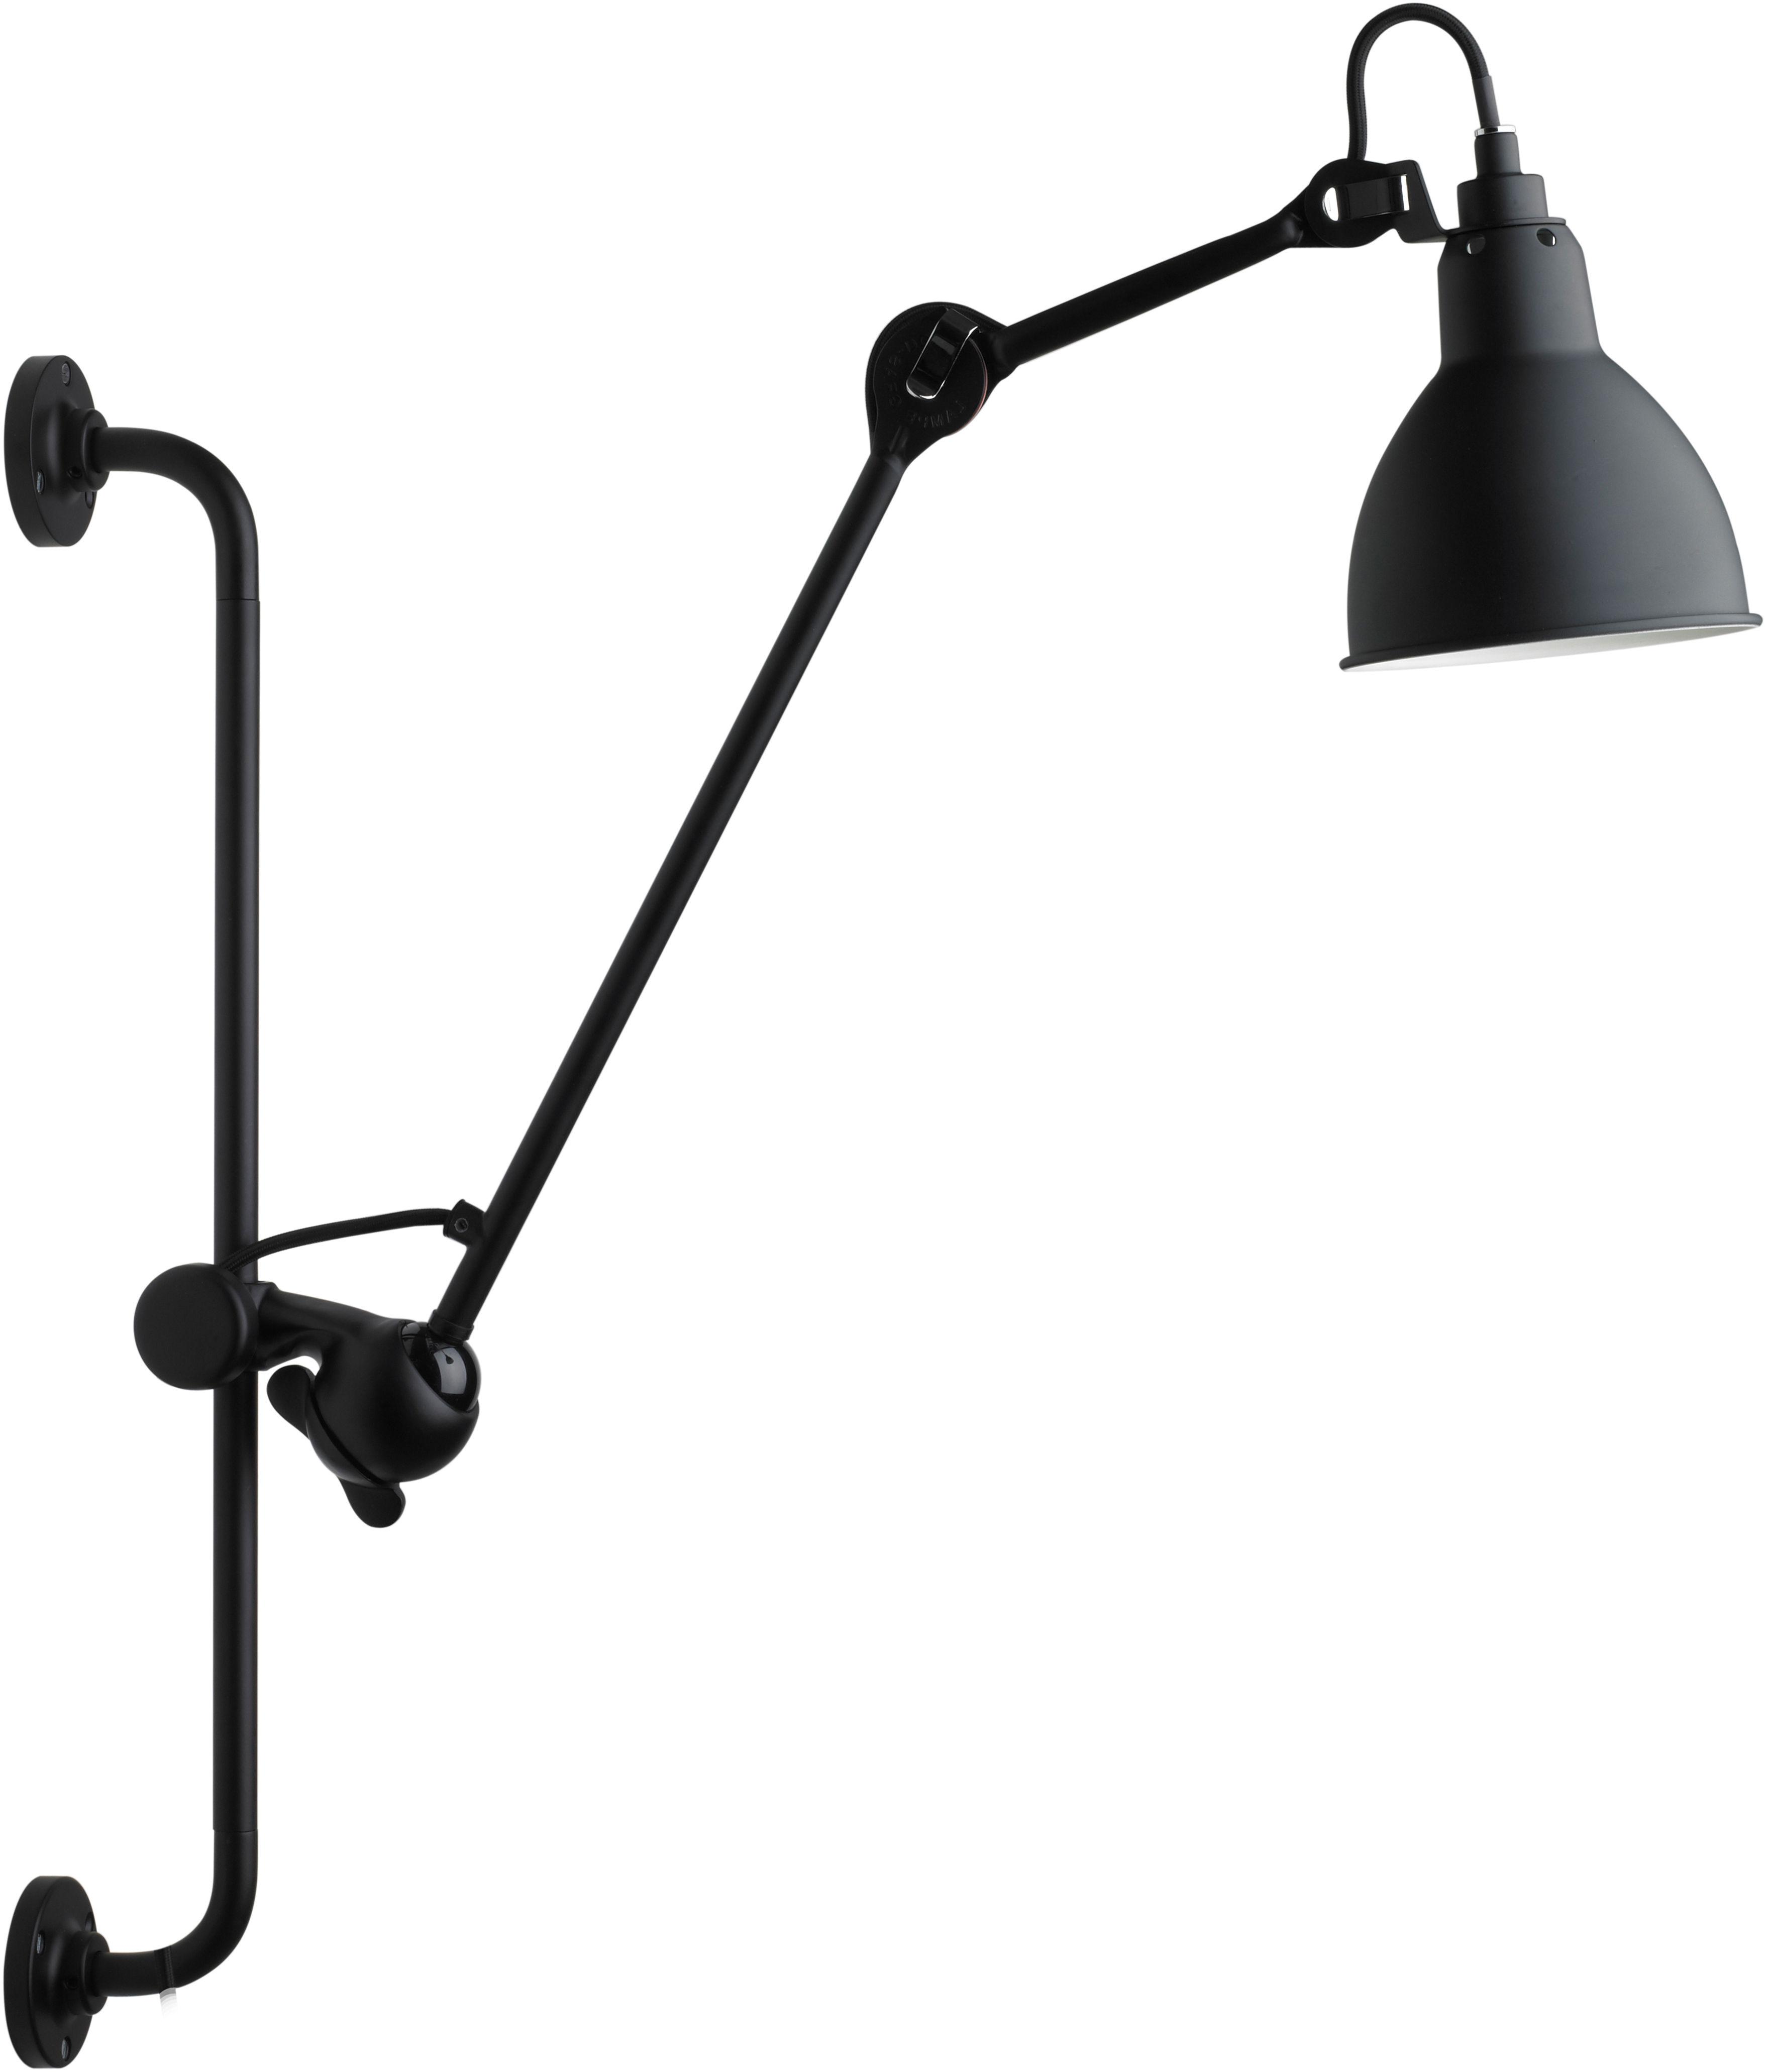 applique n 210 lampe gras noir satin dcw ditions. Black Bedroom Furniture Sets. Home Design Ideas